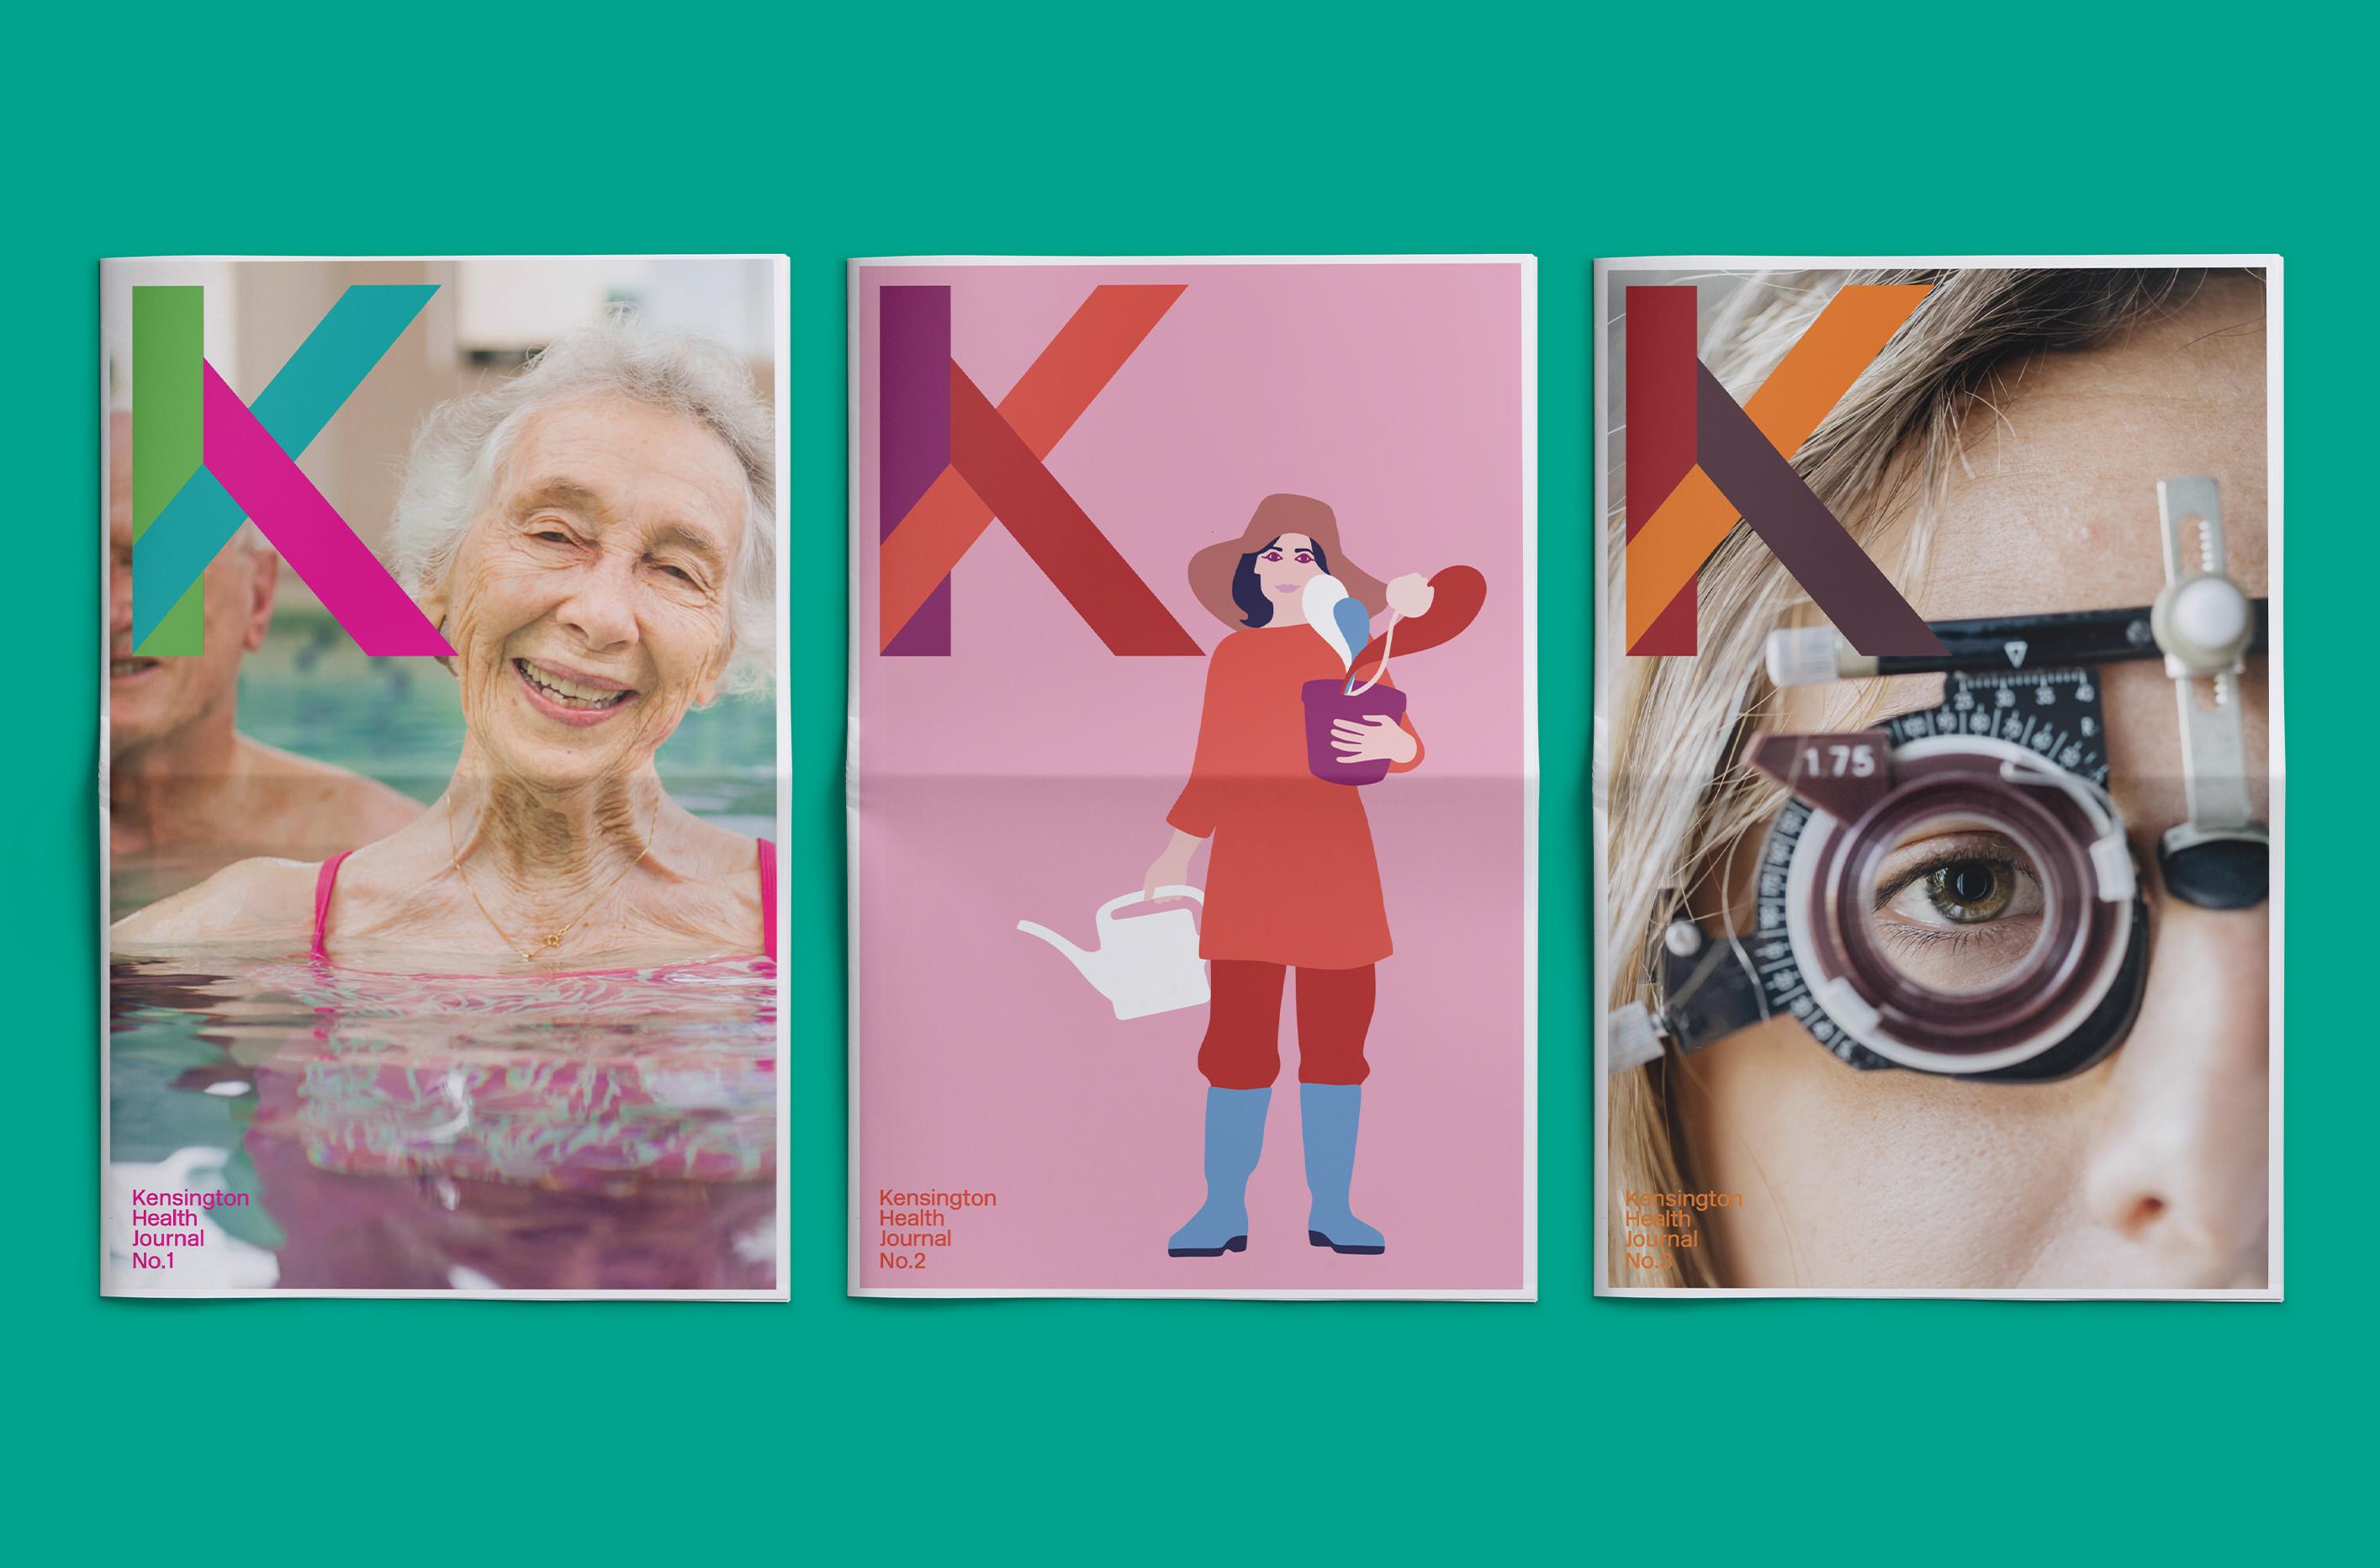 Kensington Health Tabloid Journal